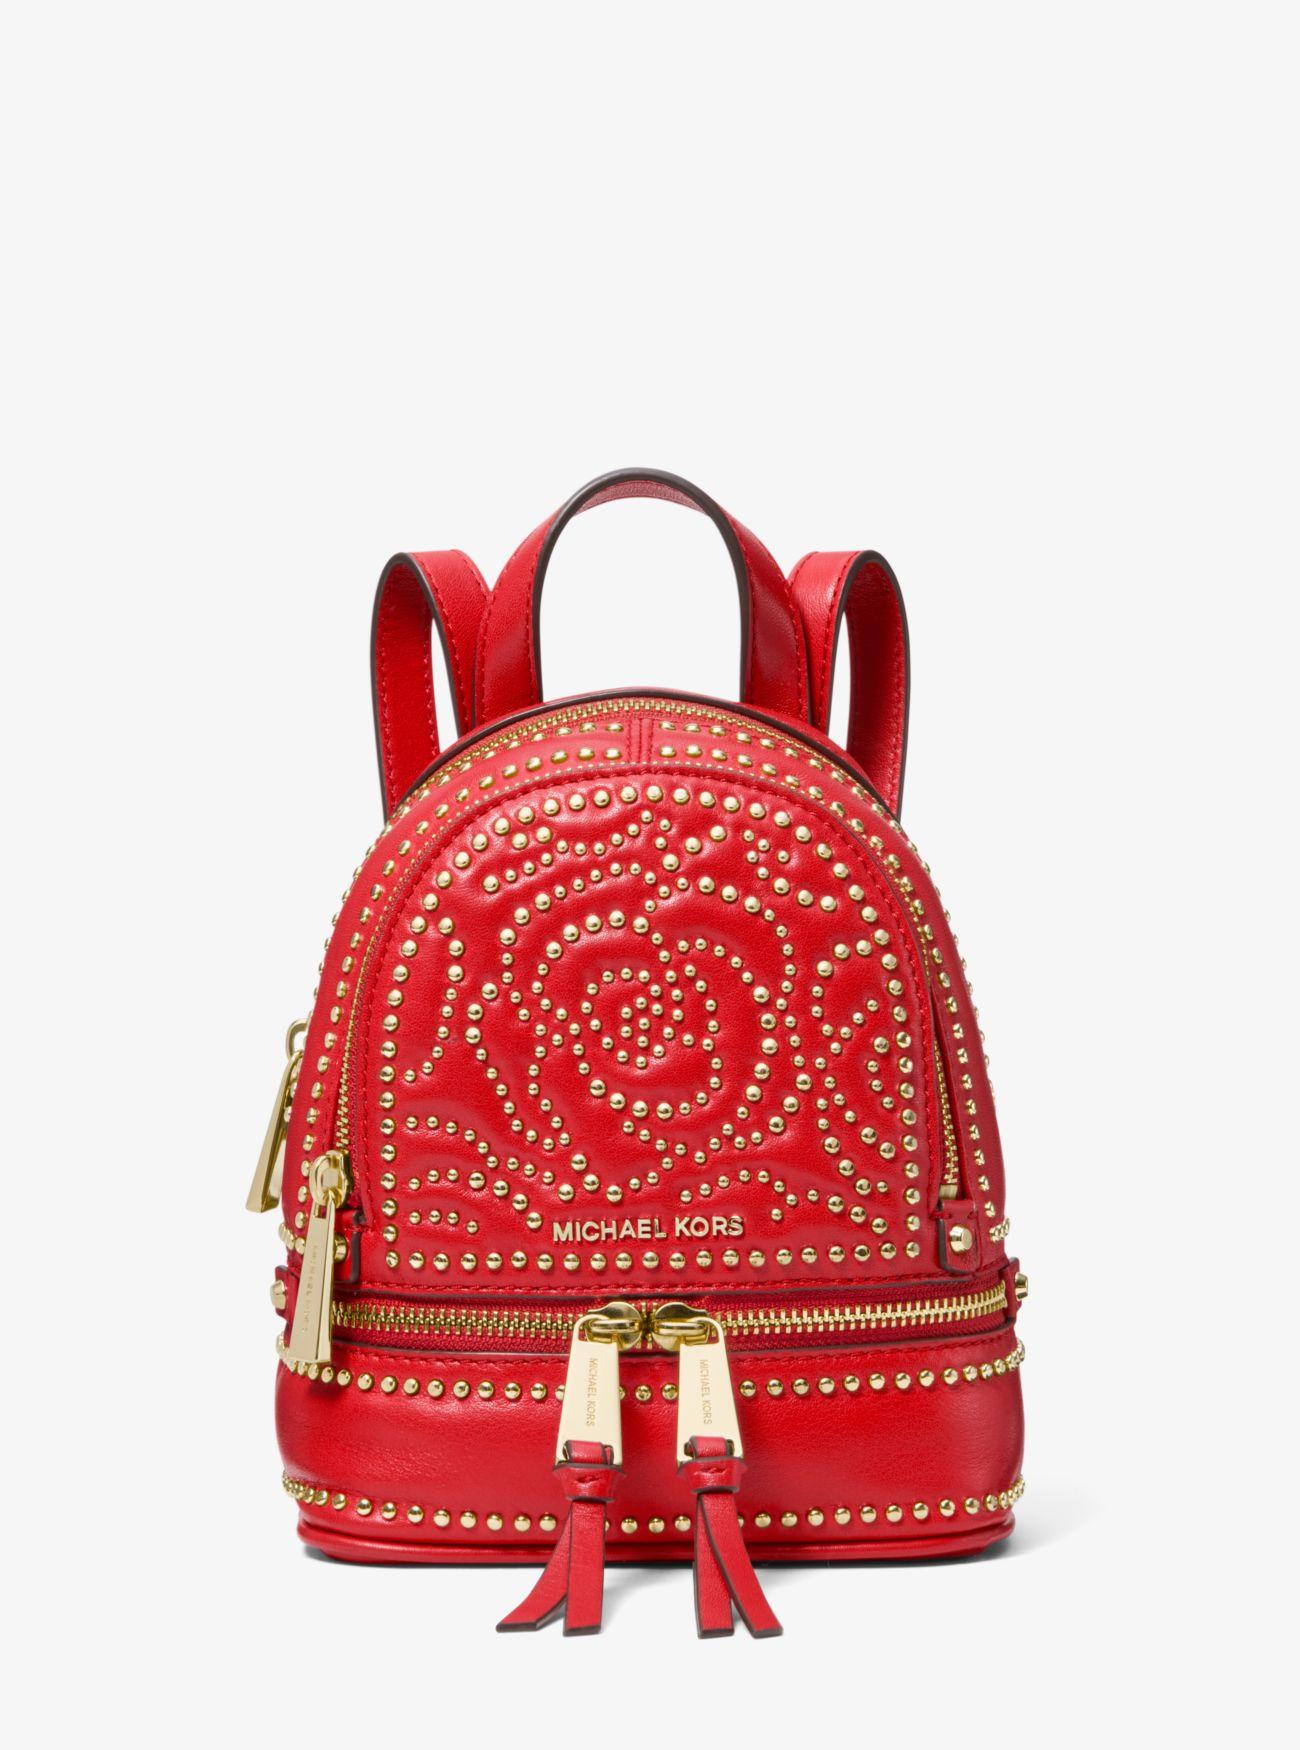 a437a03b30ef Michael Kors - Red Rhea Mini Rose Studded Leather Backpack - Lyst. View  fullscreen